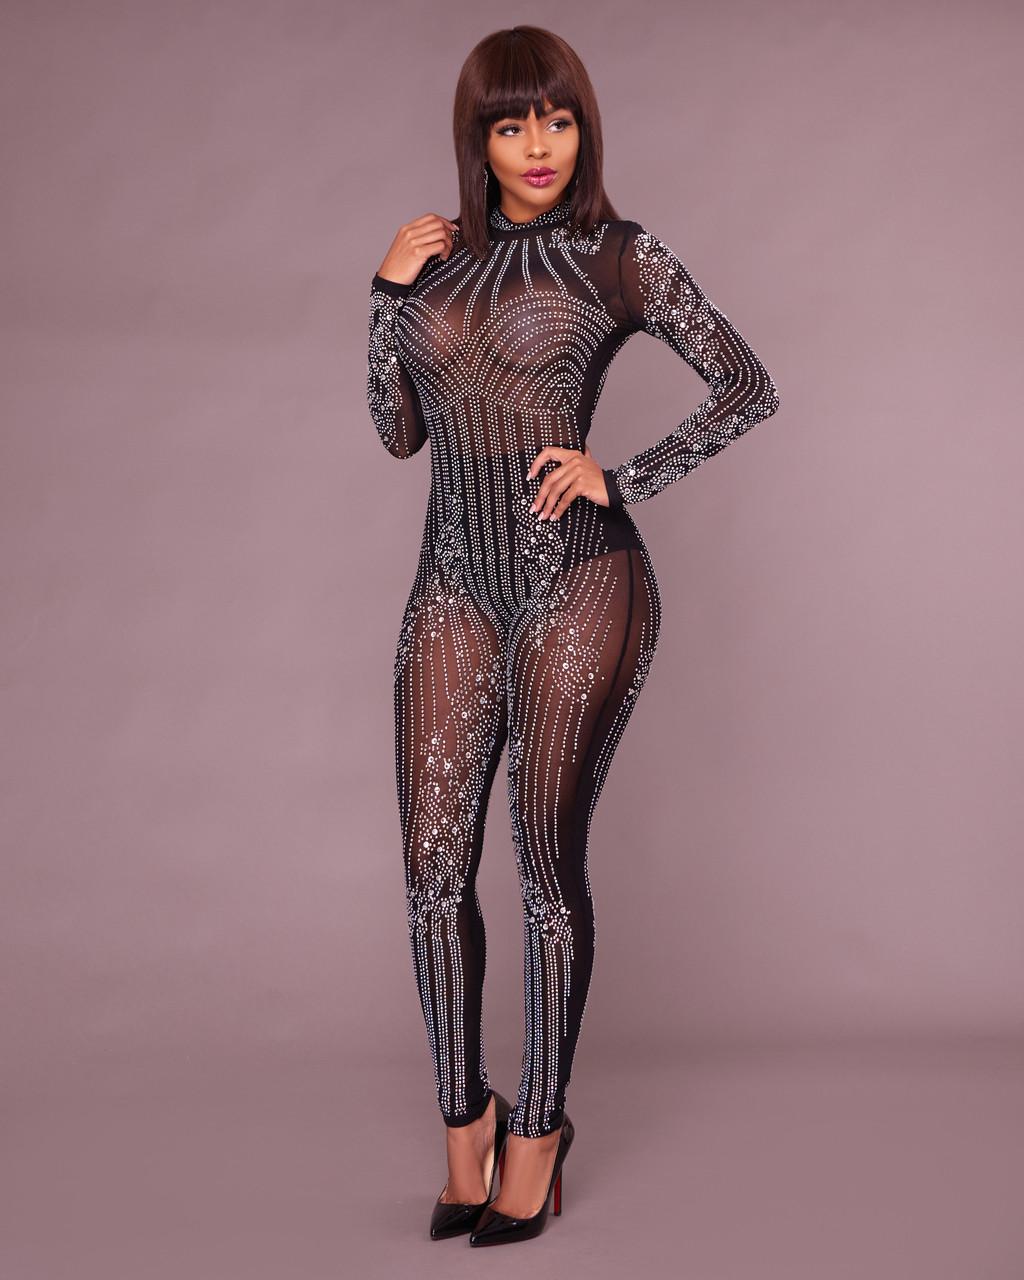 b739ca7dc1 Yessy Black Rhinestones Semi-Sheer Jumpsuit. Price   100.00. Image 1.  Larger   More Photos